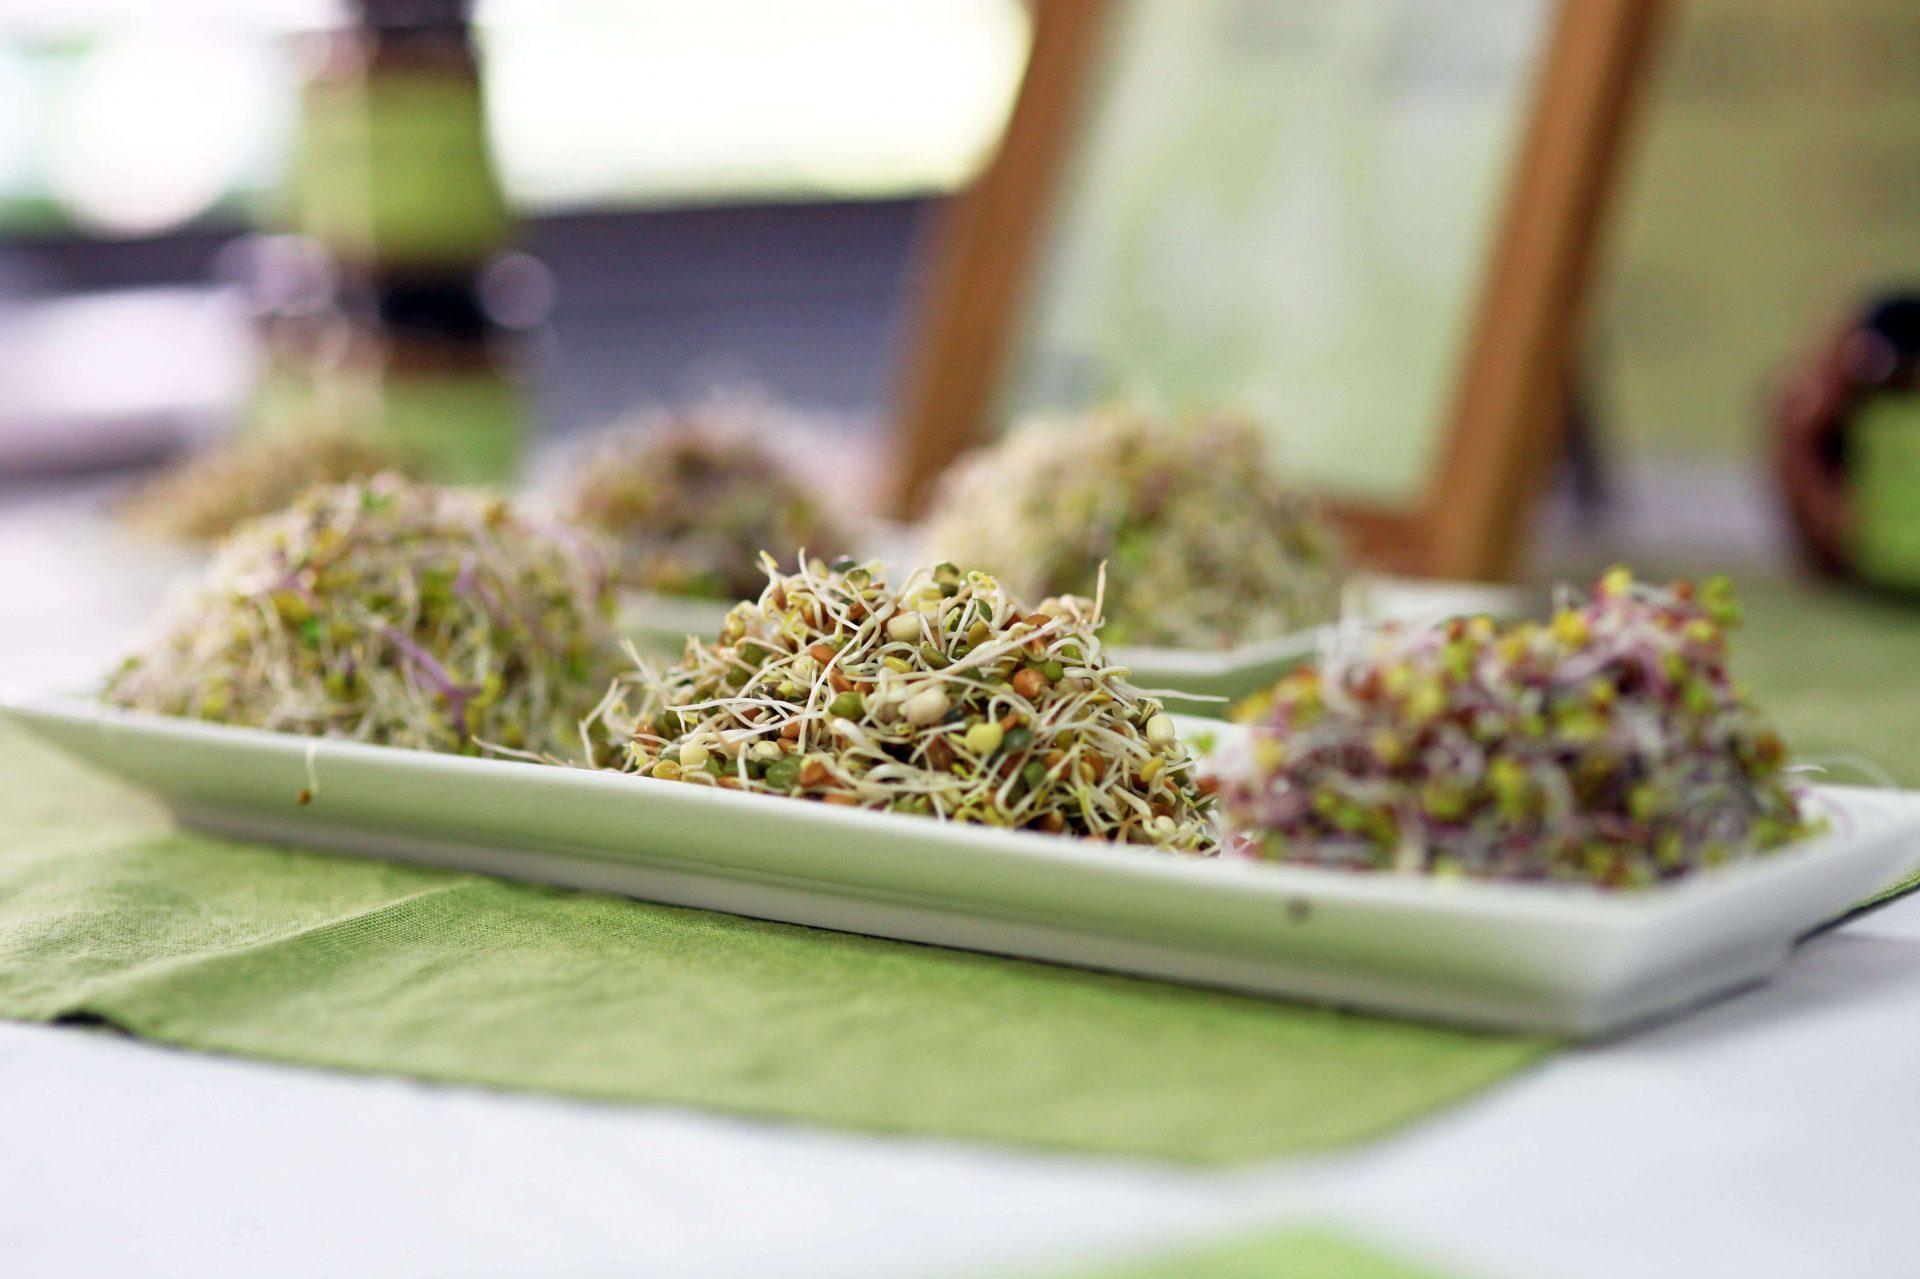 sempreverde-biogermogli-tavola